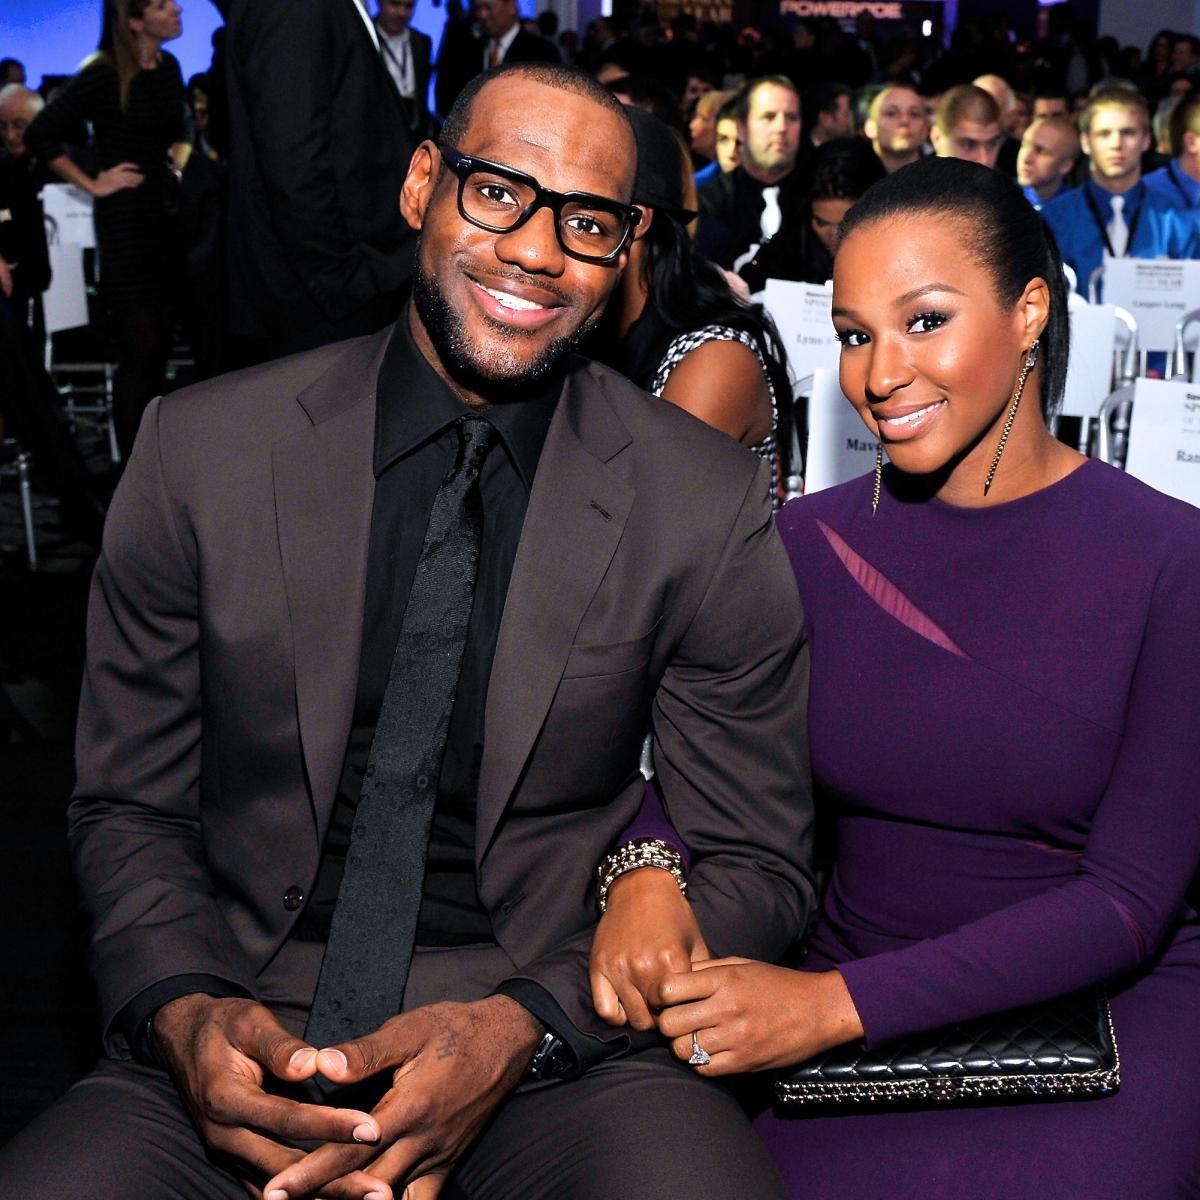 LeBron James and Savannah Brinson Wedding: Attendees ...